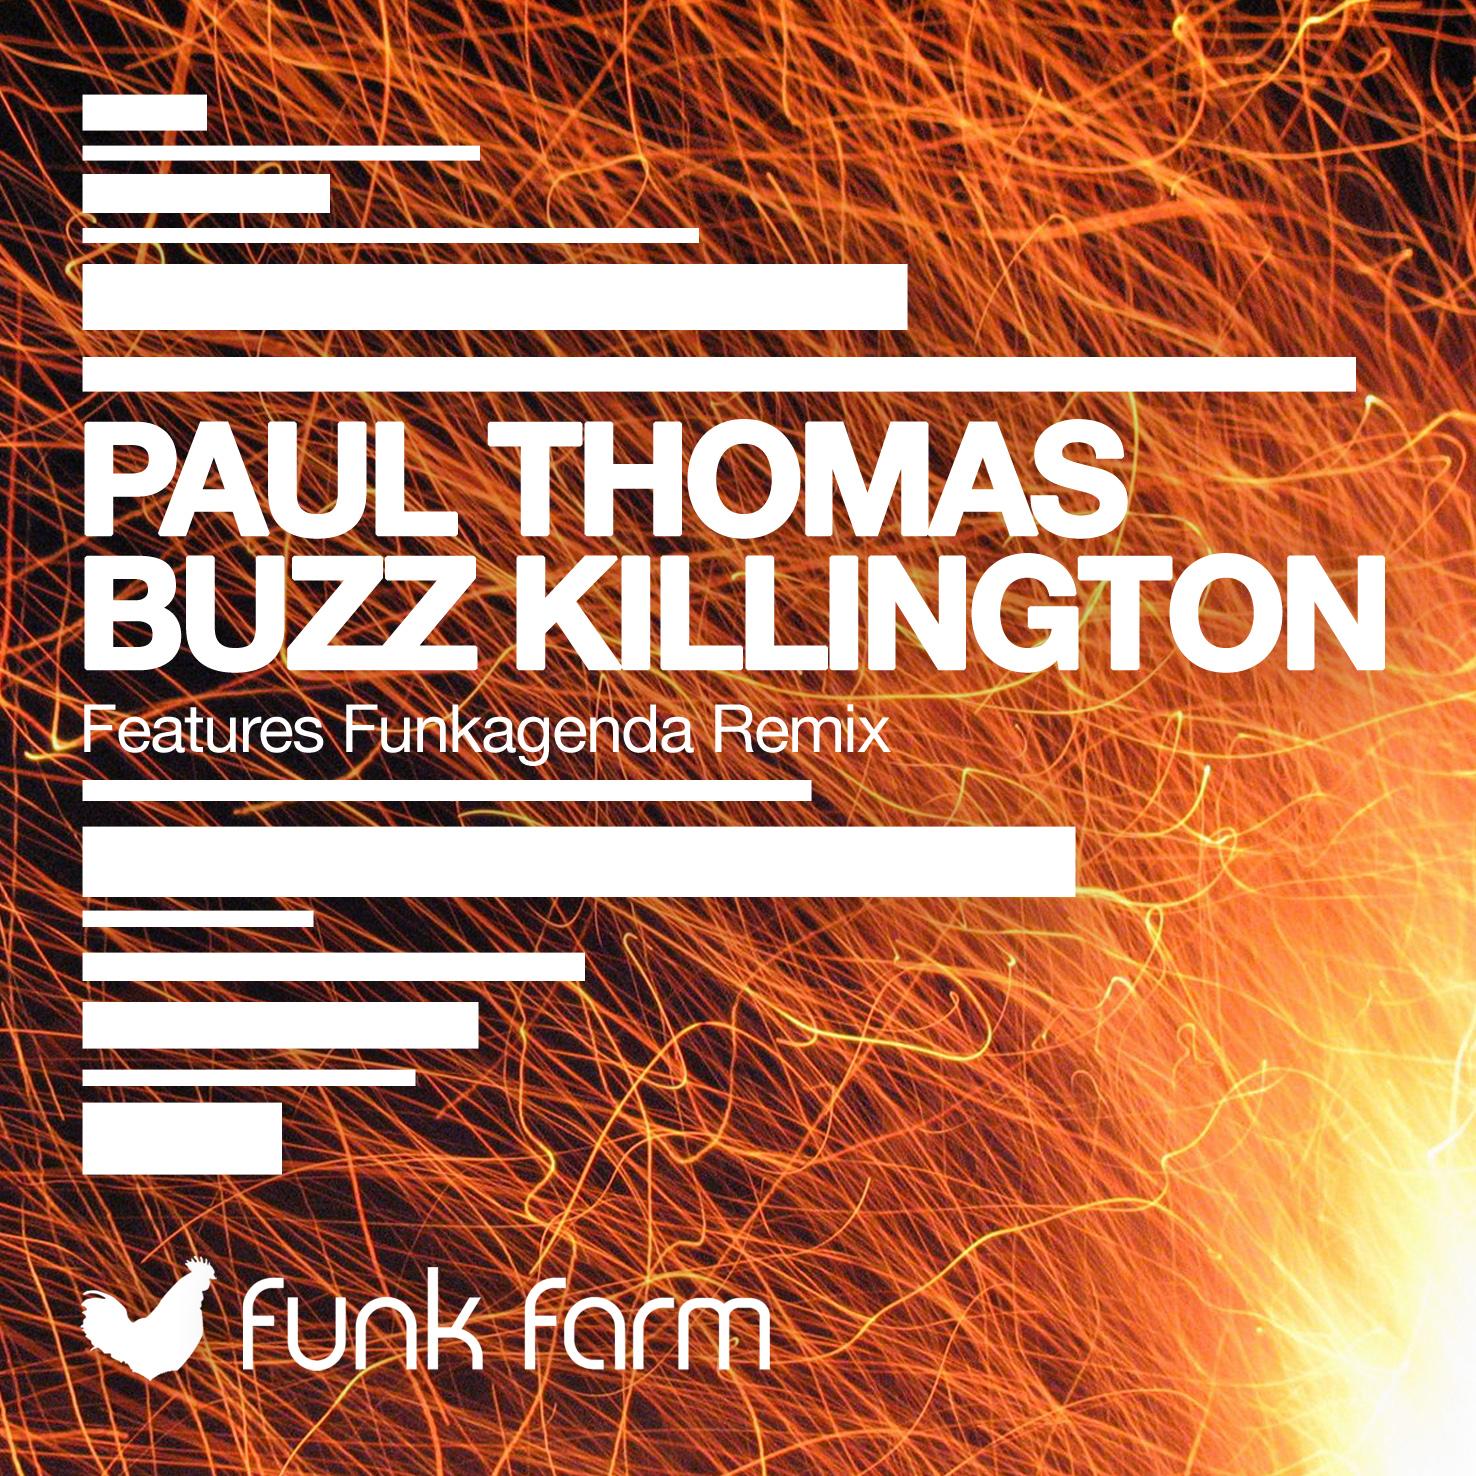 Paul Thomas - Buzz Killington (incl. Funkagenda Remix) [Funk Farm]